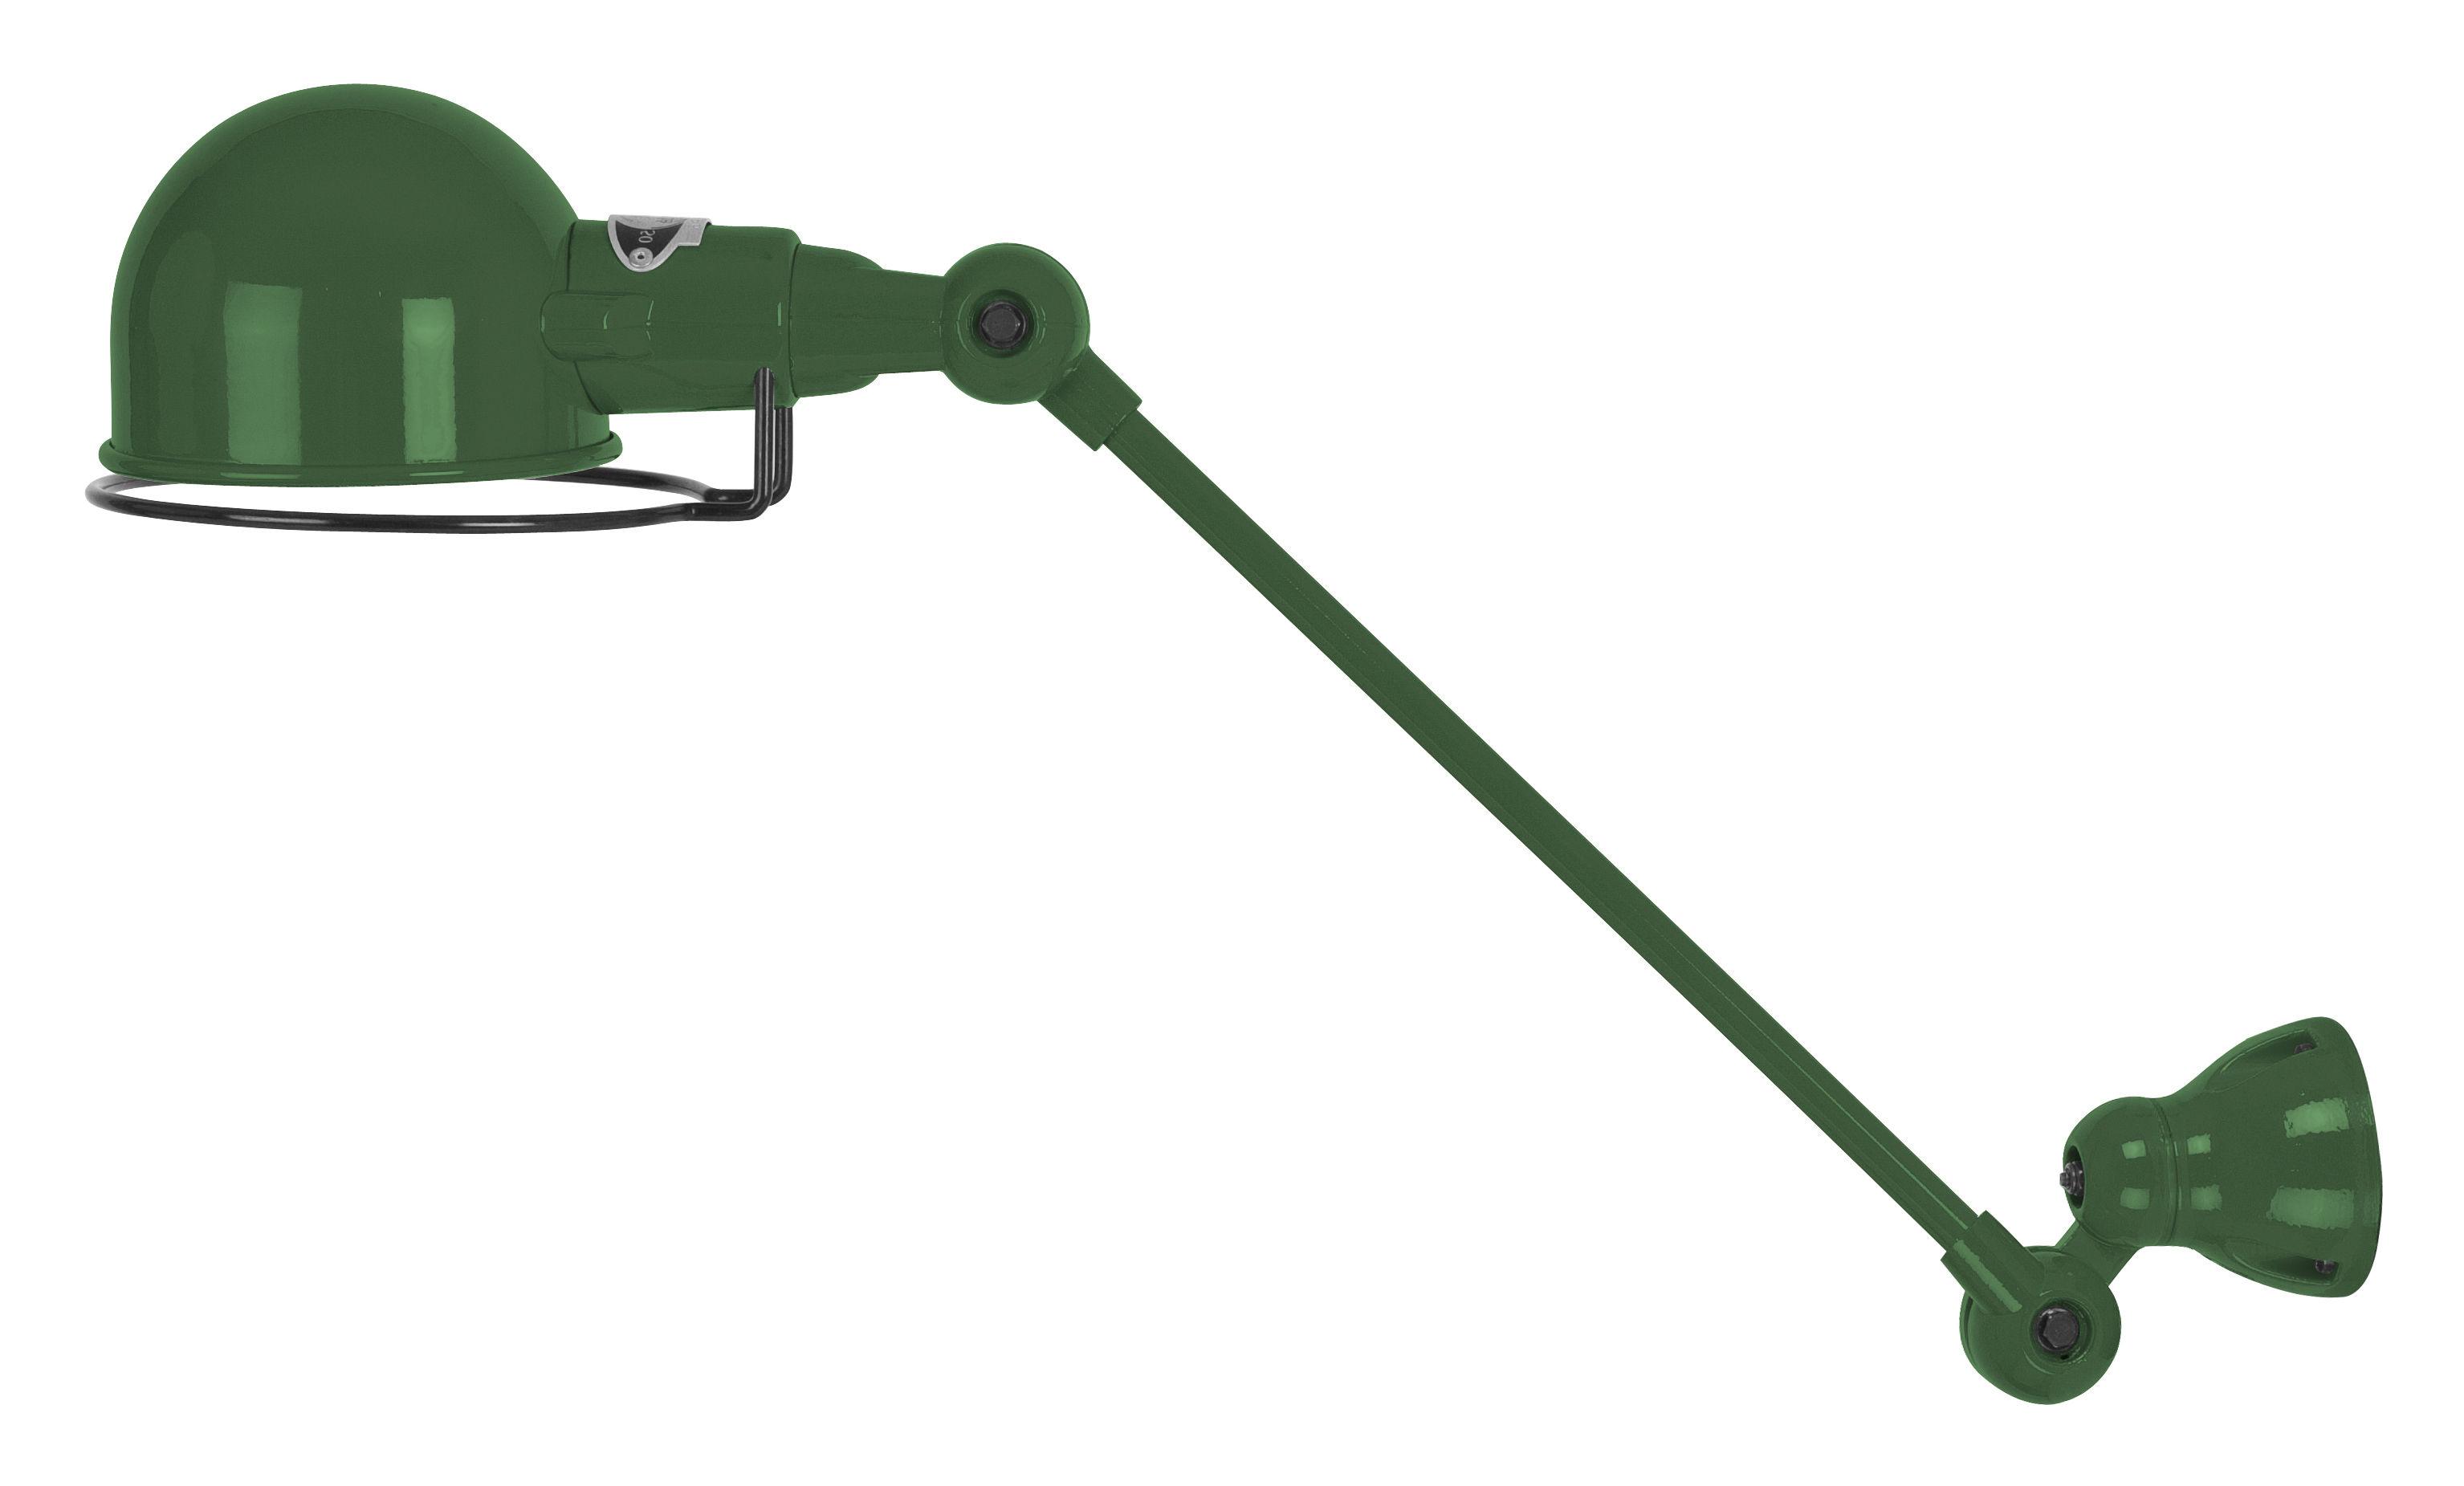 Leuchten - Wandleuchten - Signal Wandleuchte / mit Gelenkarm - L 30 cm - Jieldé - Olivgrün, glänzend - rostfreier Stahl